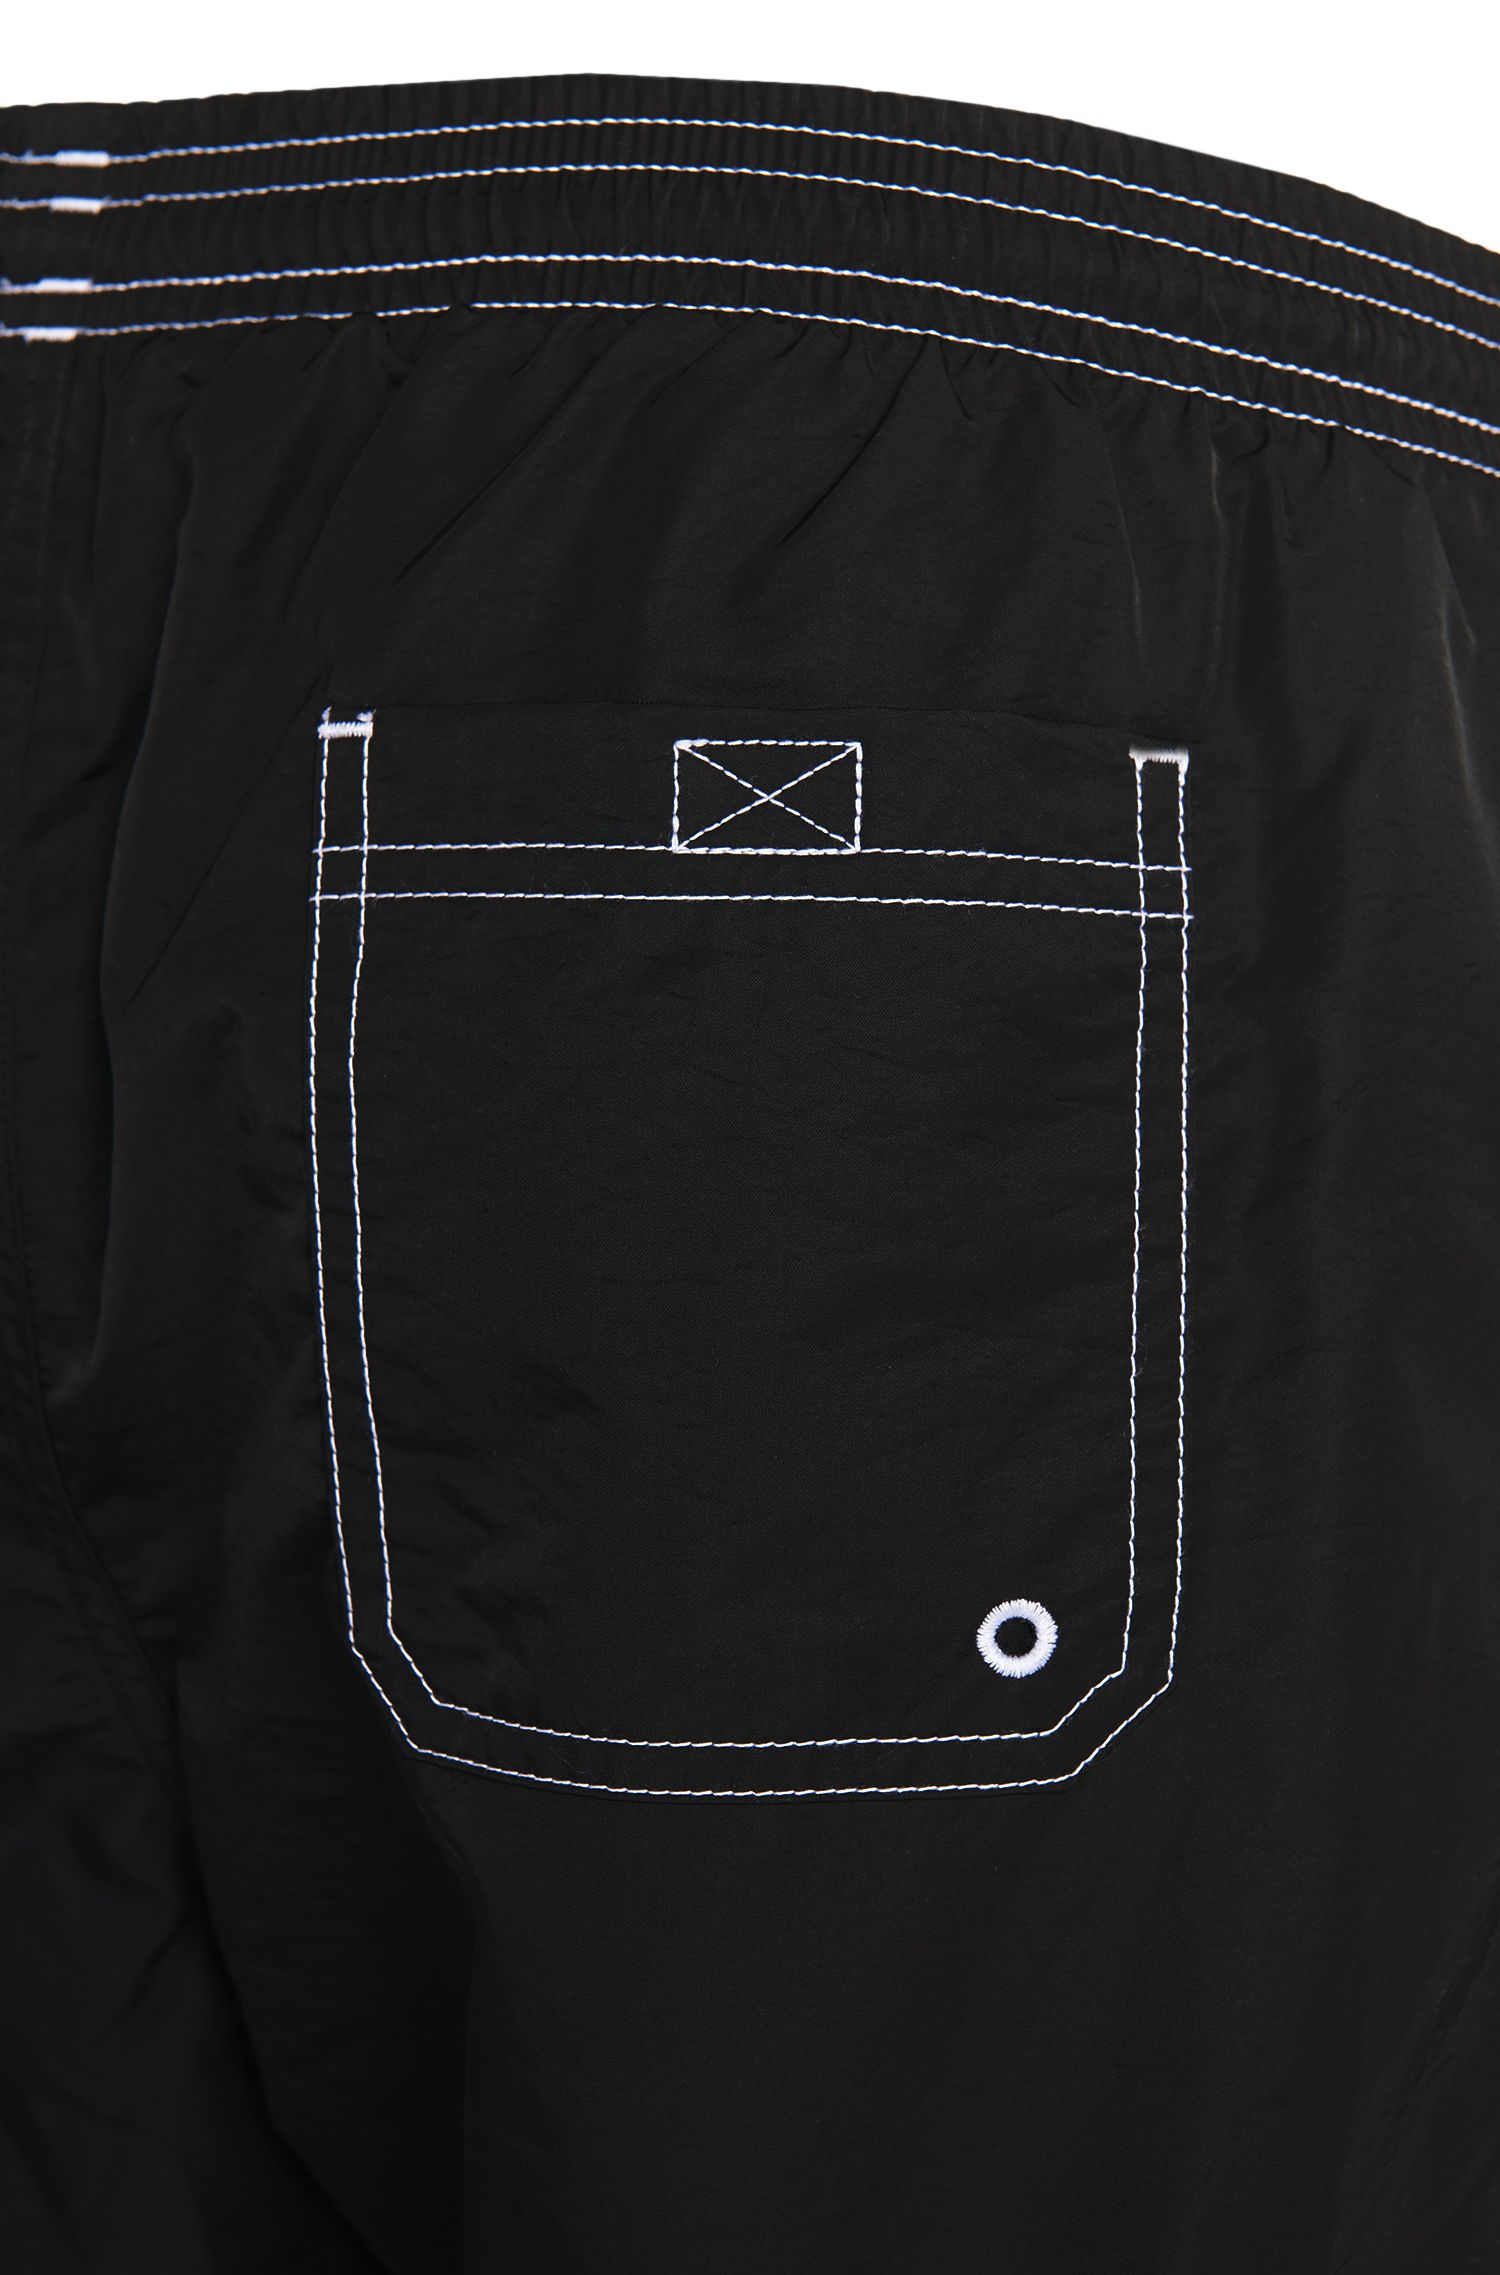 Maillot de bain en tissu technique, Noir